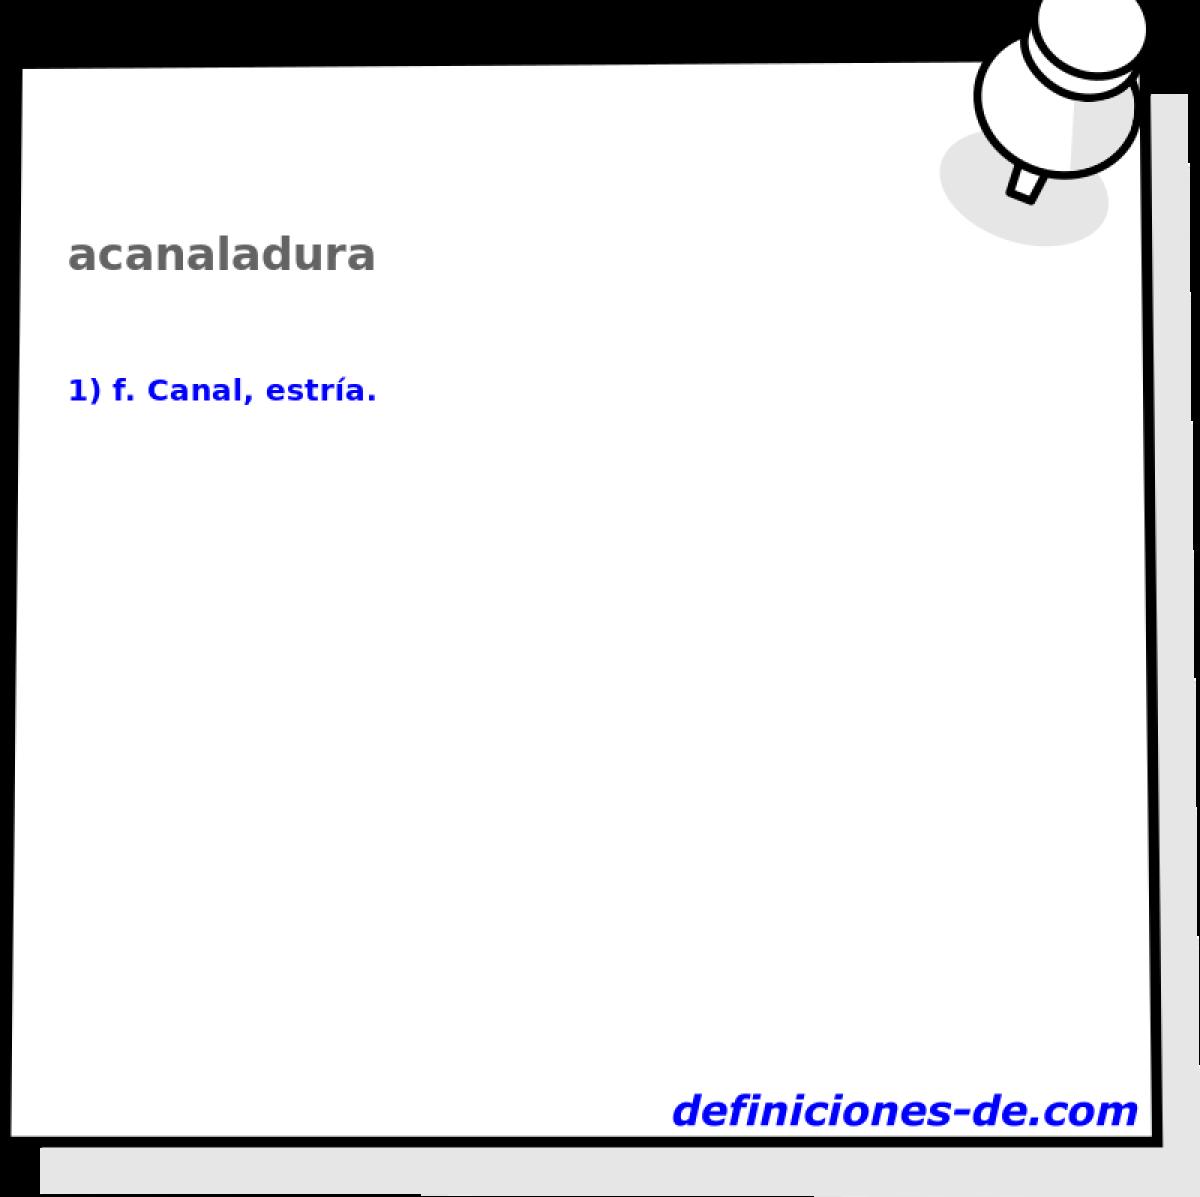 Qué significa Acanaladura?